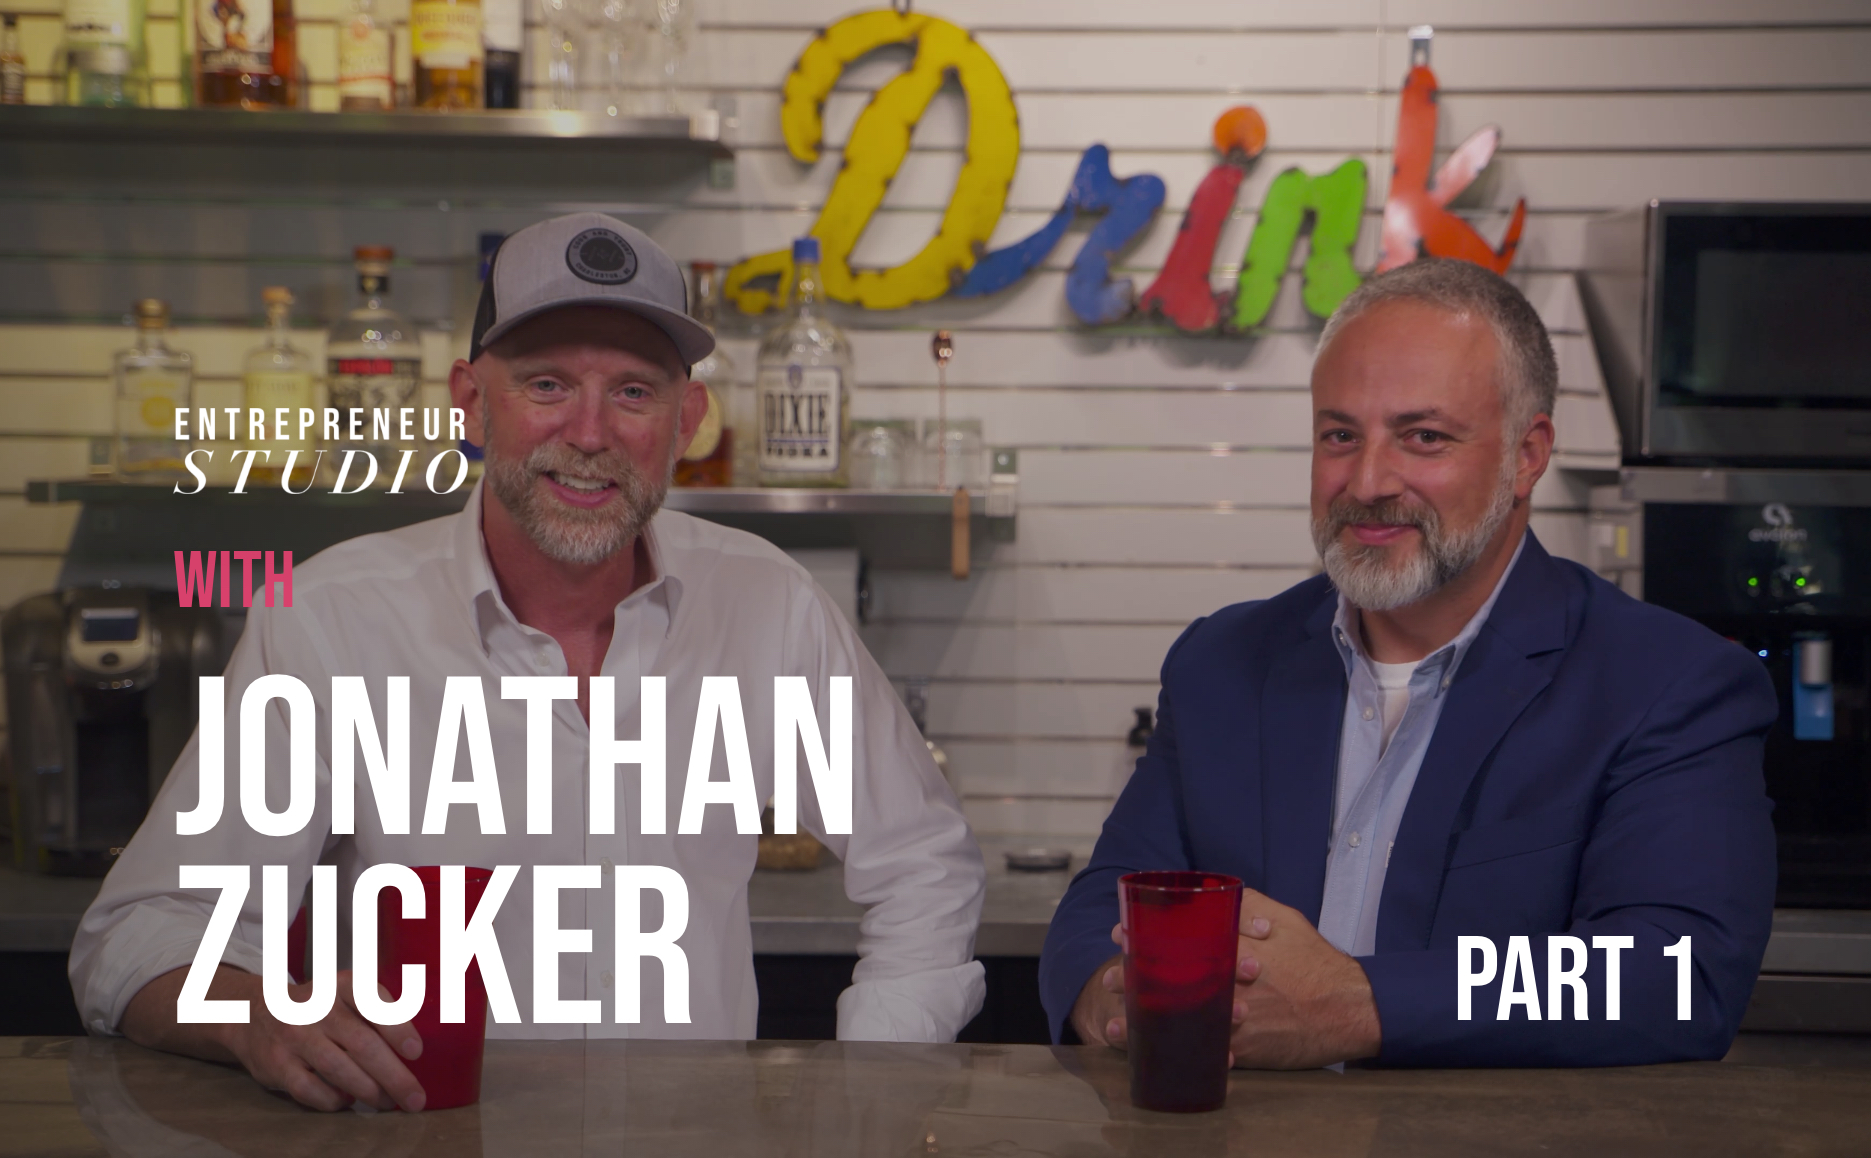 Entrepreneur Studio Series - Episode 1 - Teaching the Entrepreneurial & Giveback Spirit with Jonathan Zucker